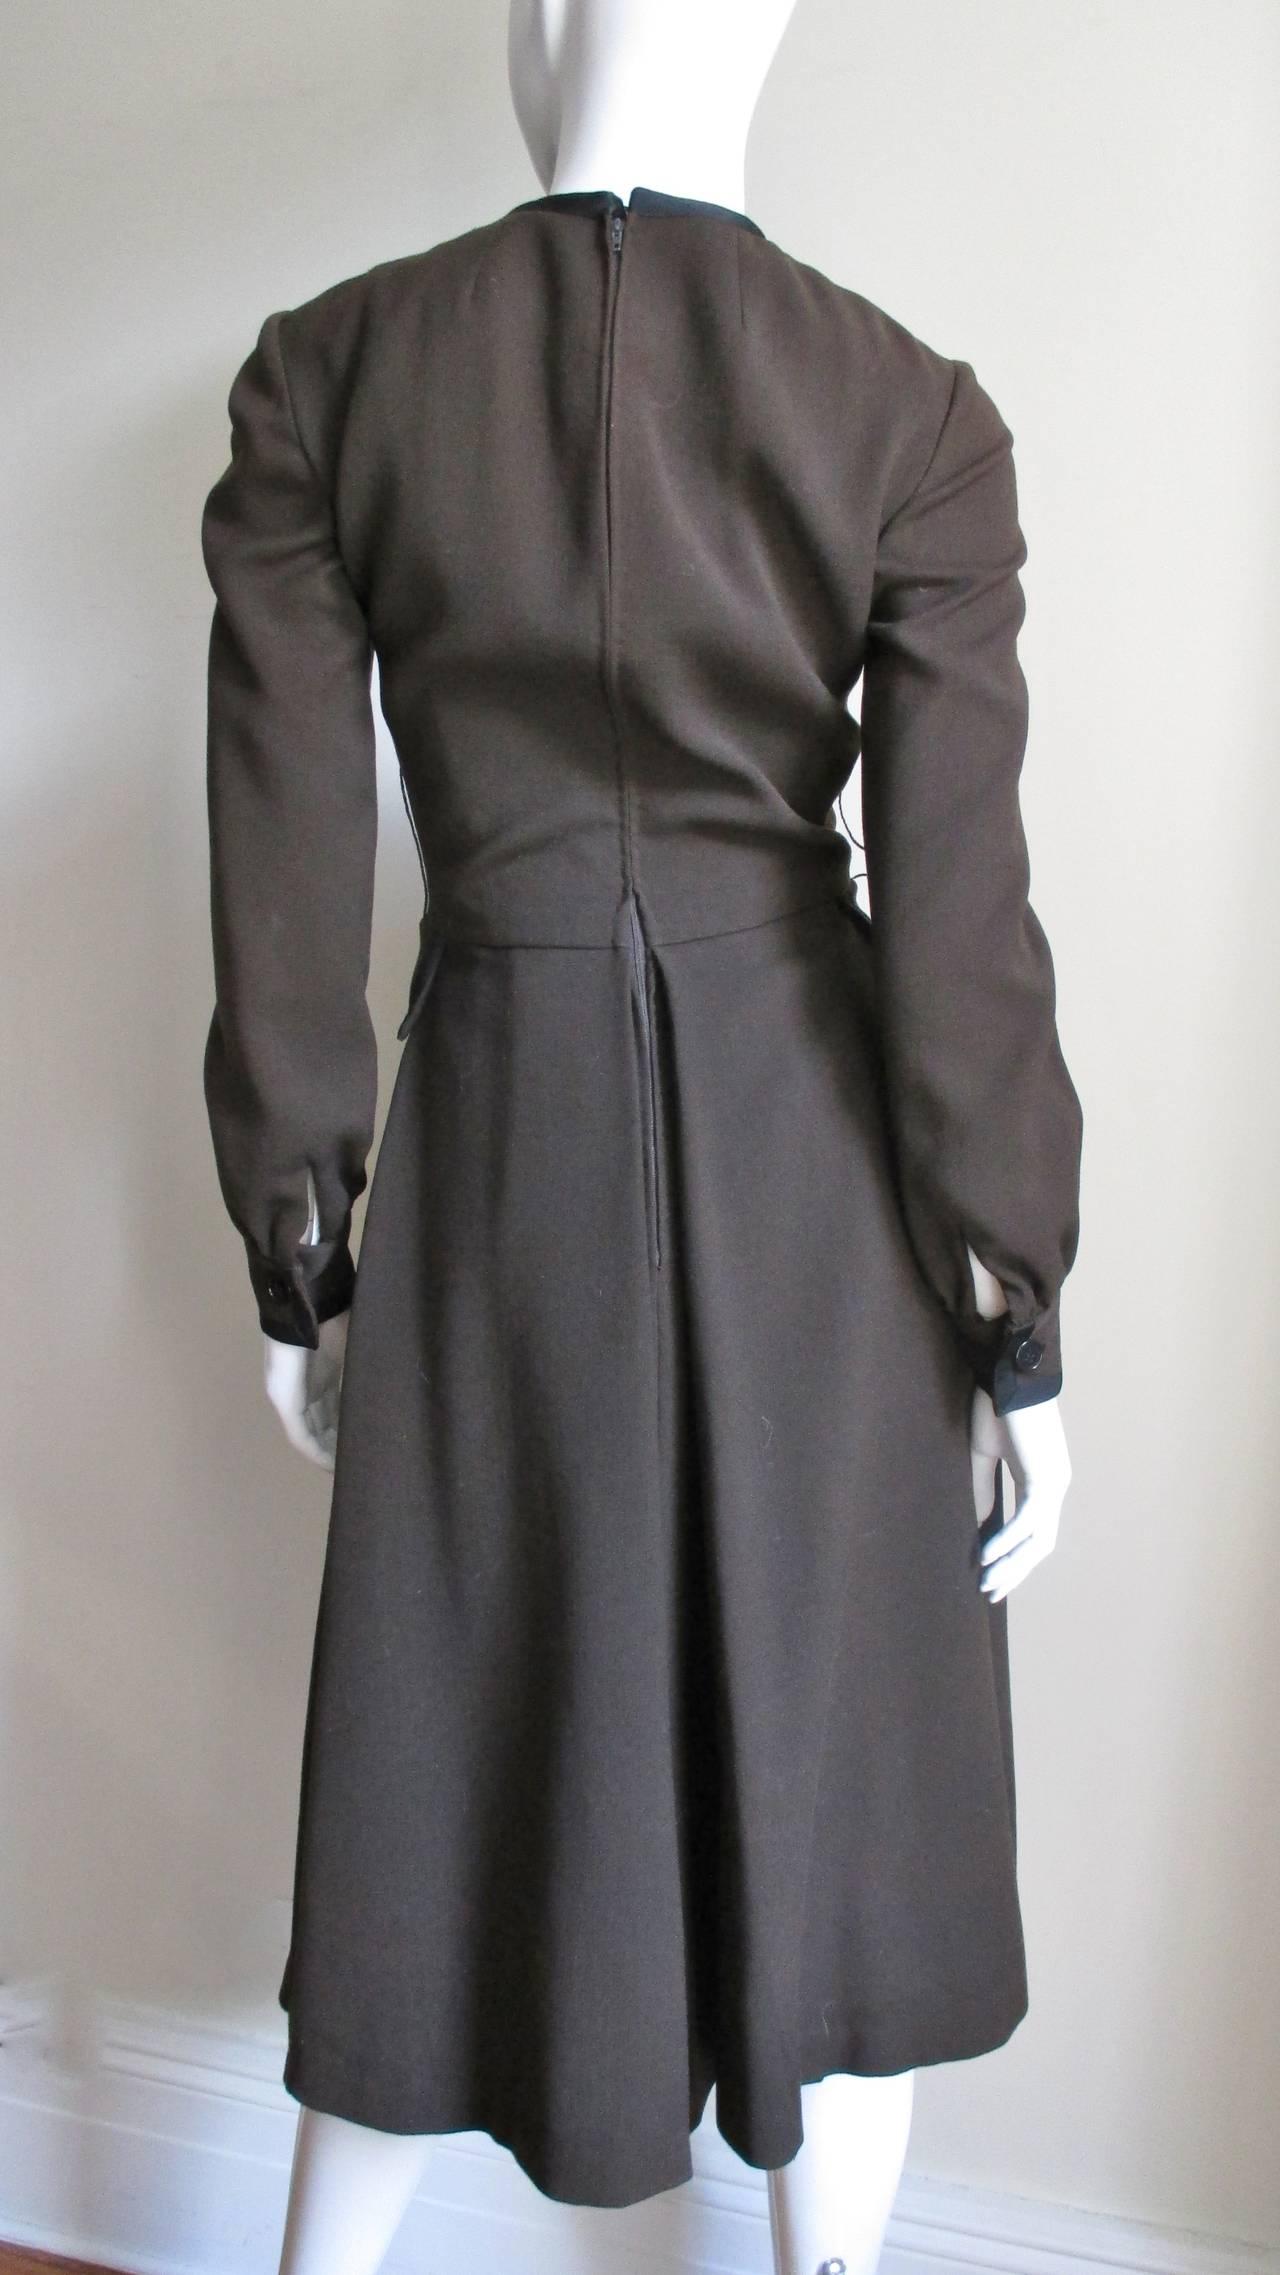 Iconic Geoffrey Beene 1970's Dress 6